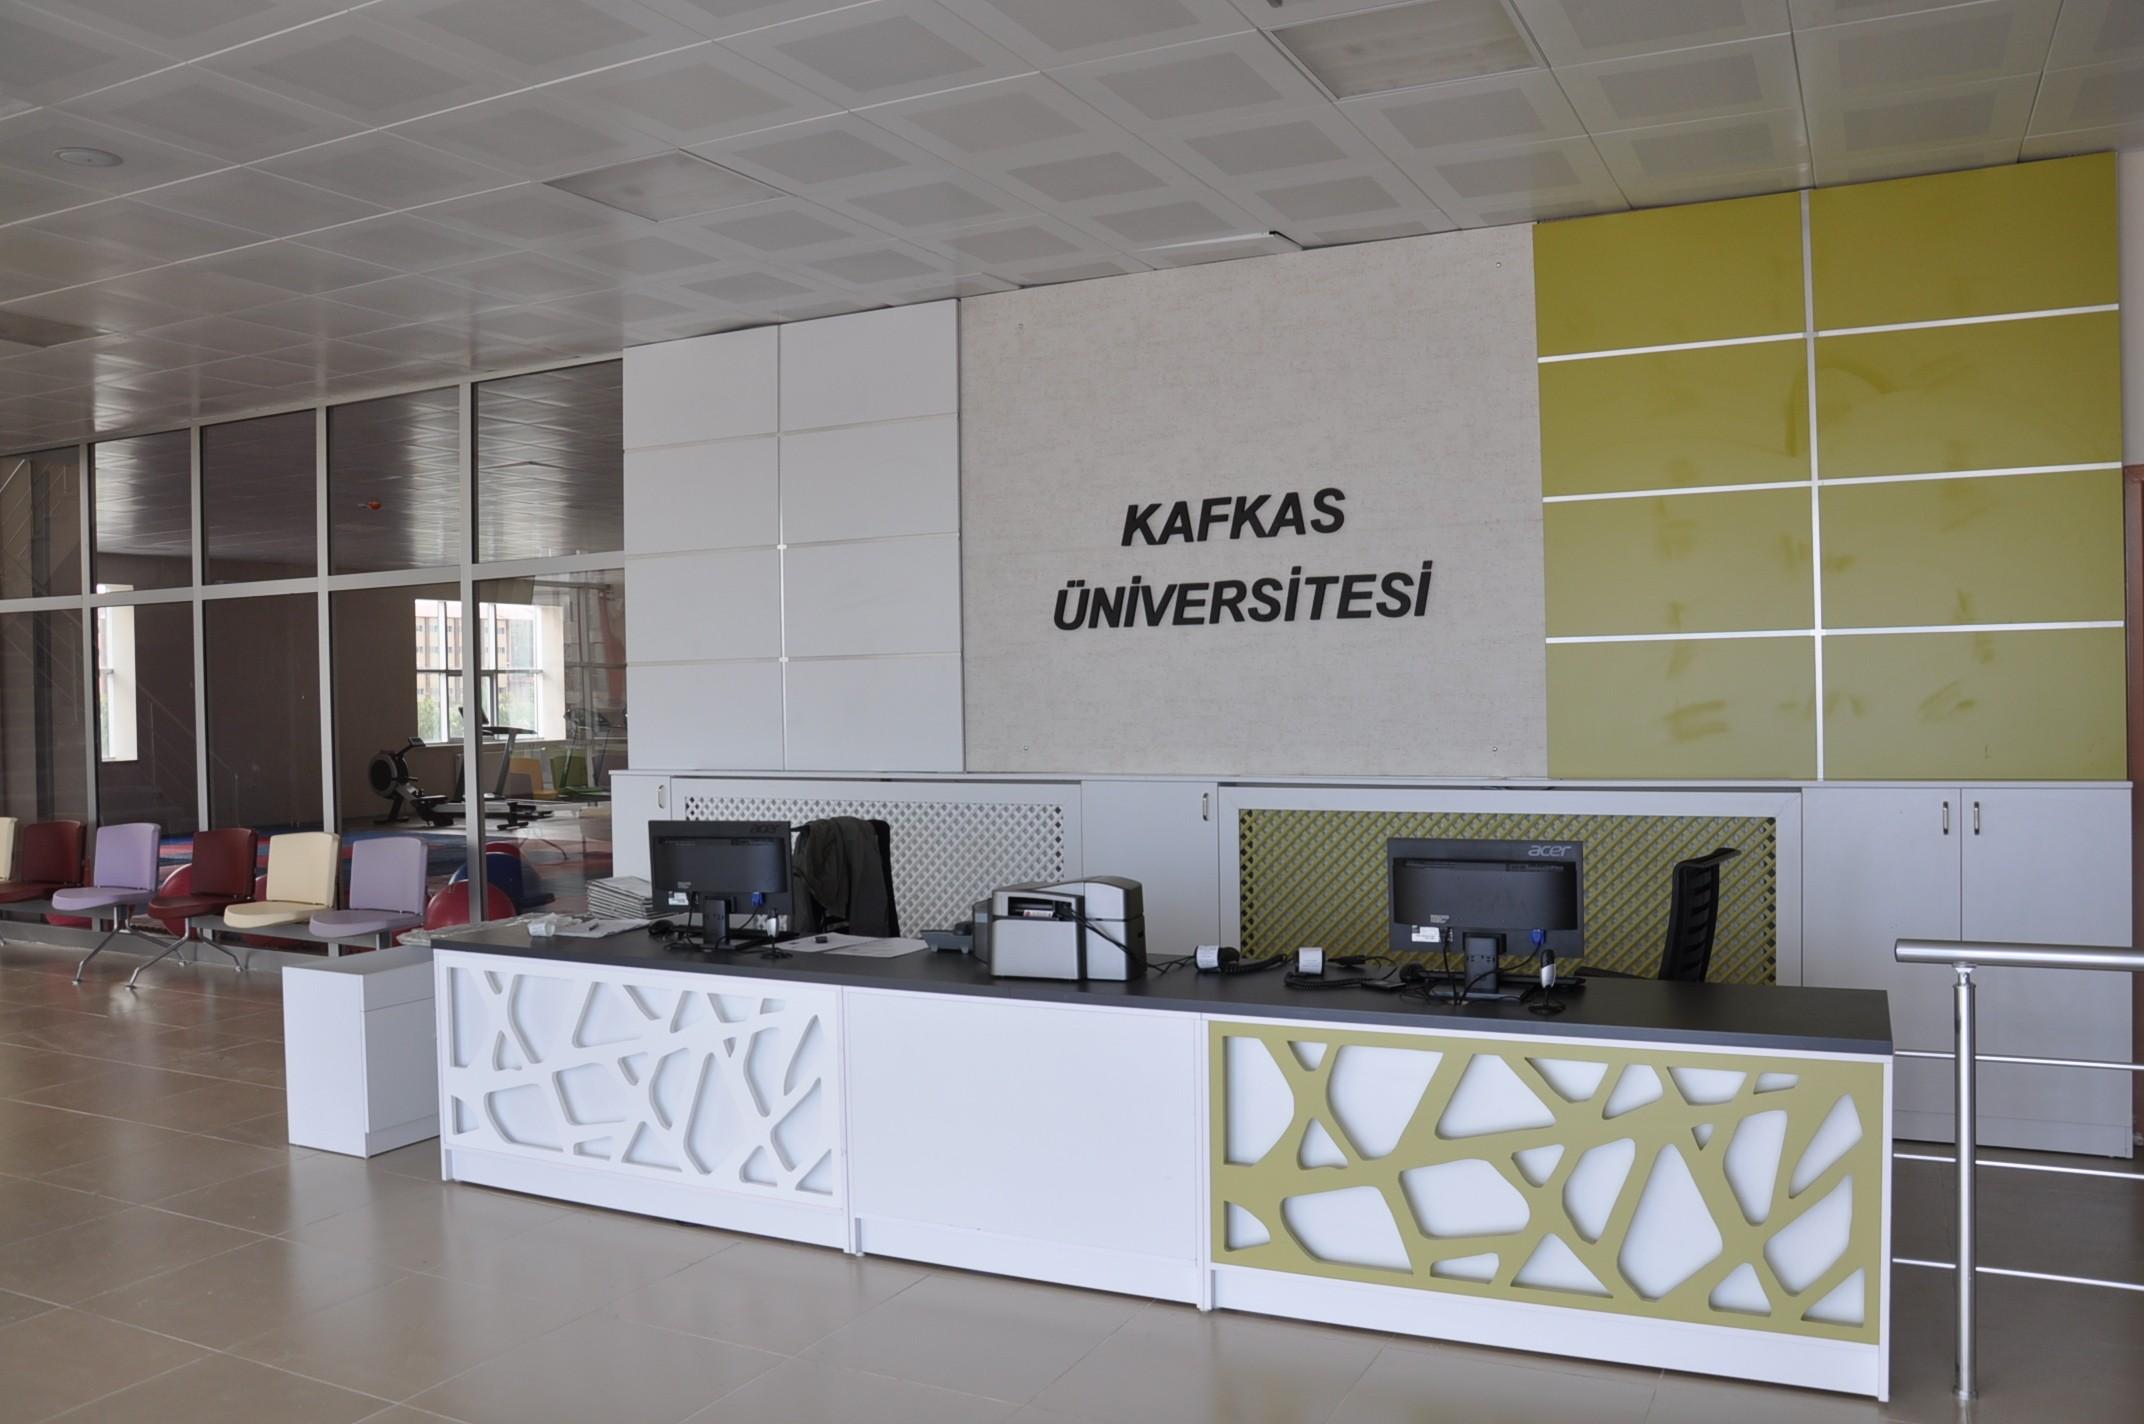 kafkas-universitesi-havuzu'na-kavustu-(5).jpg